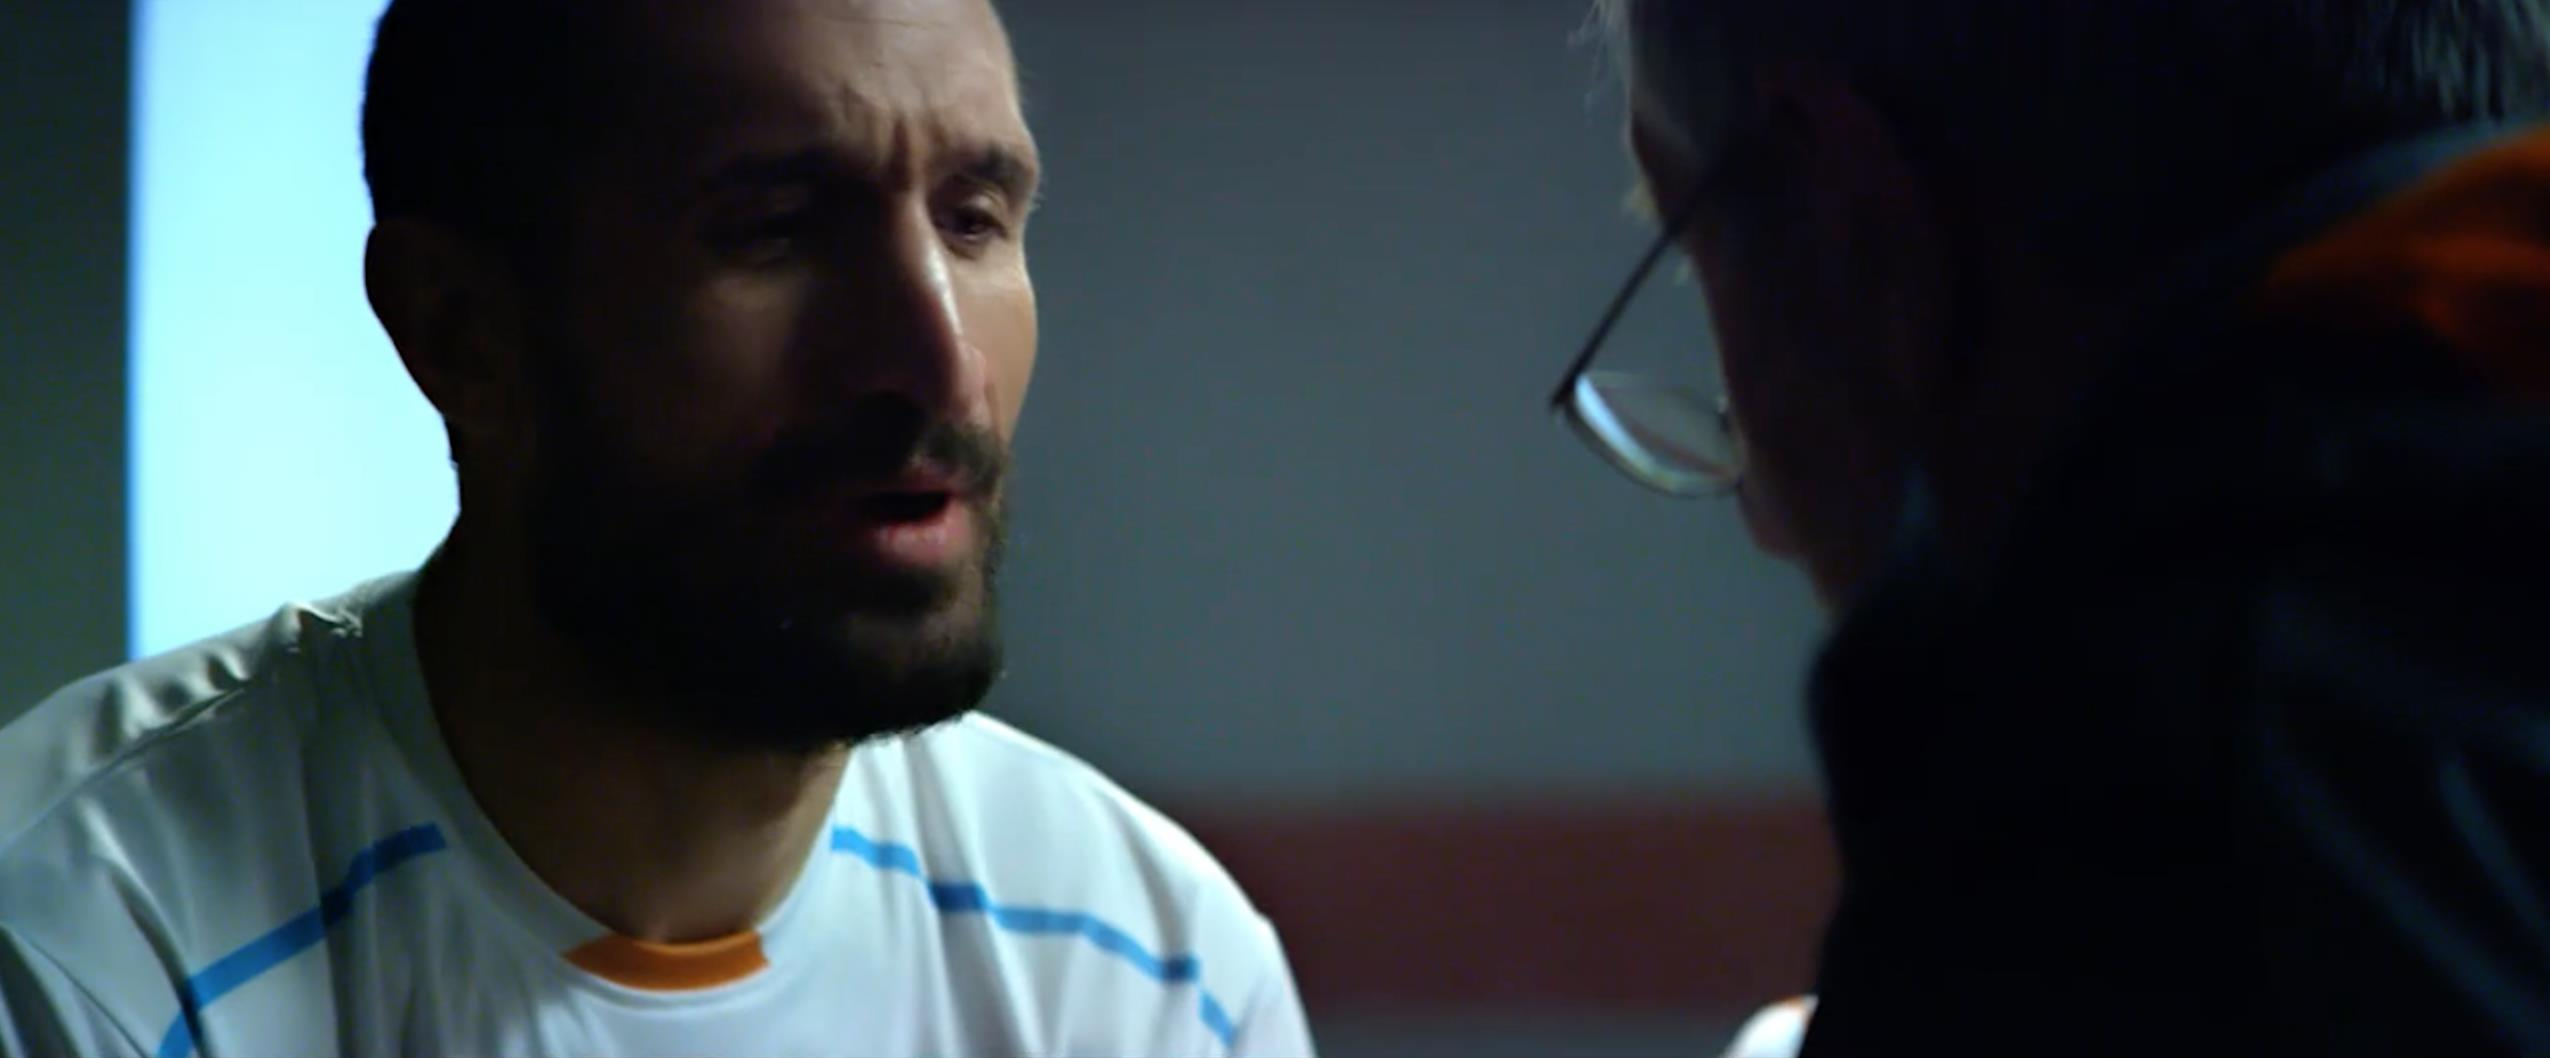 Fazland TV Campaign: Locker Room Meltdown - :40s (ENG subs)